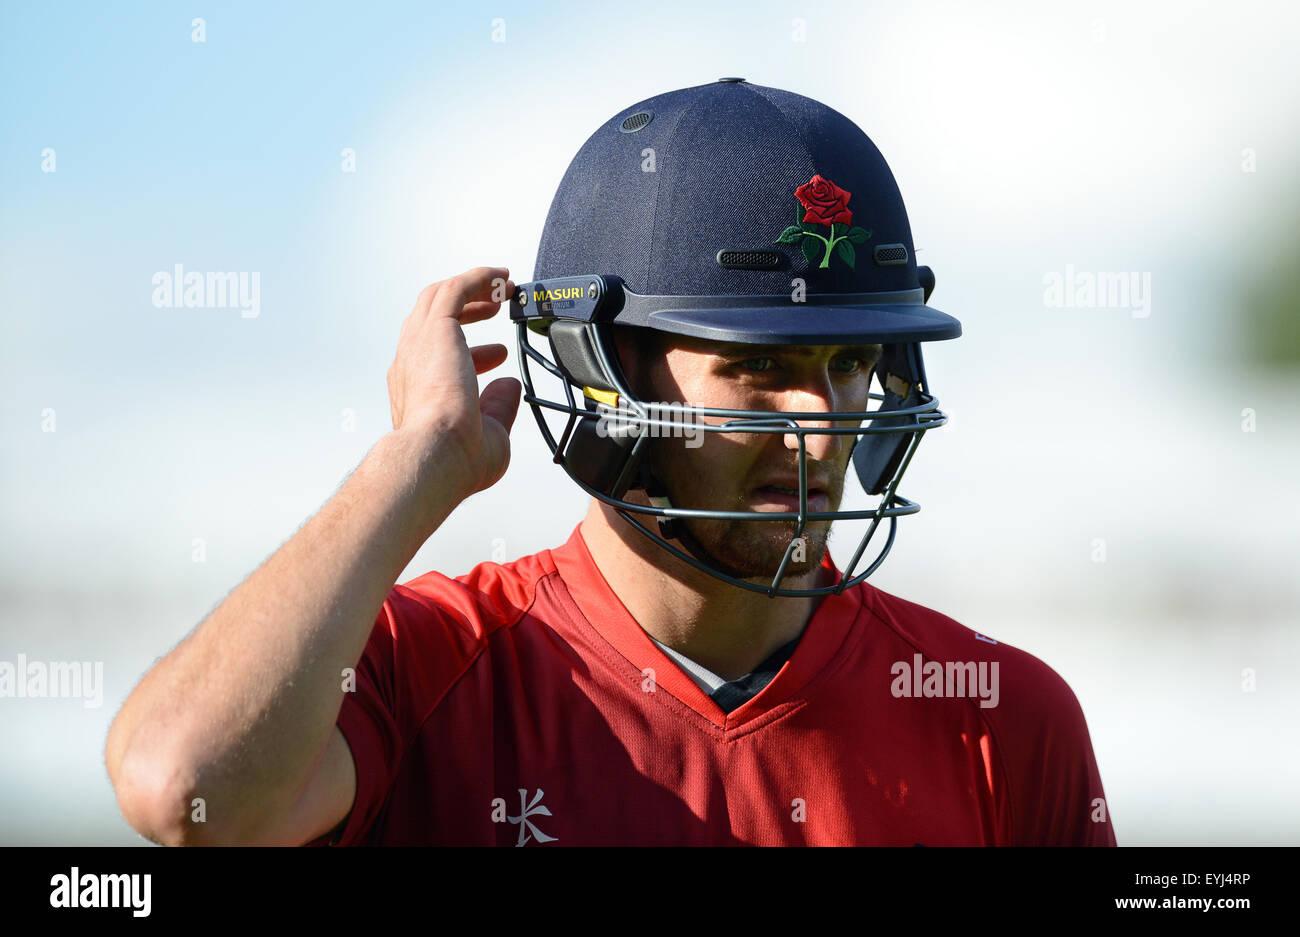 Liam Livingstone batsman cricketer for Lancashire - Stock Image